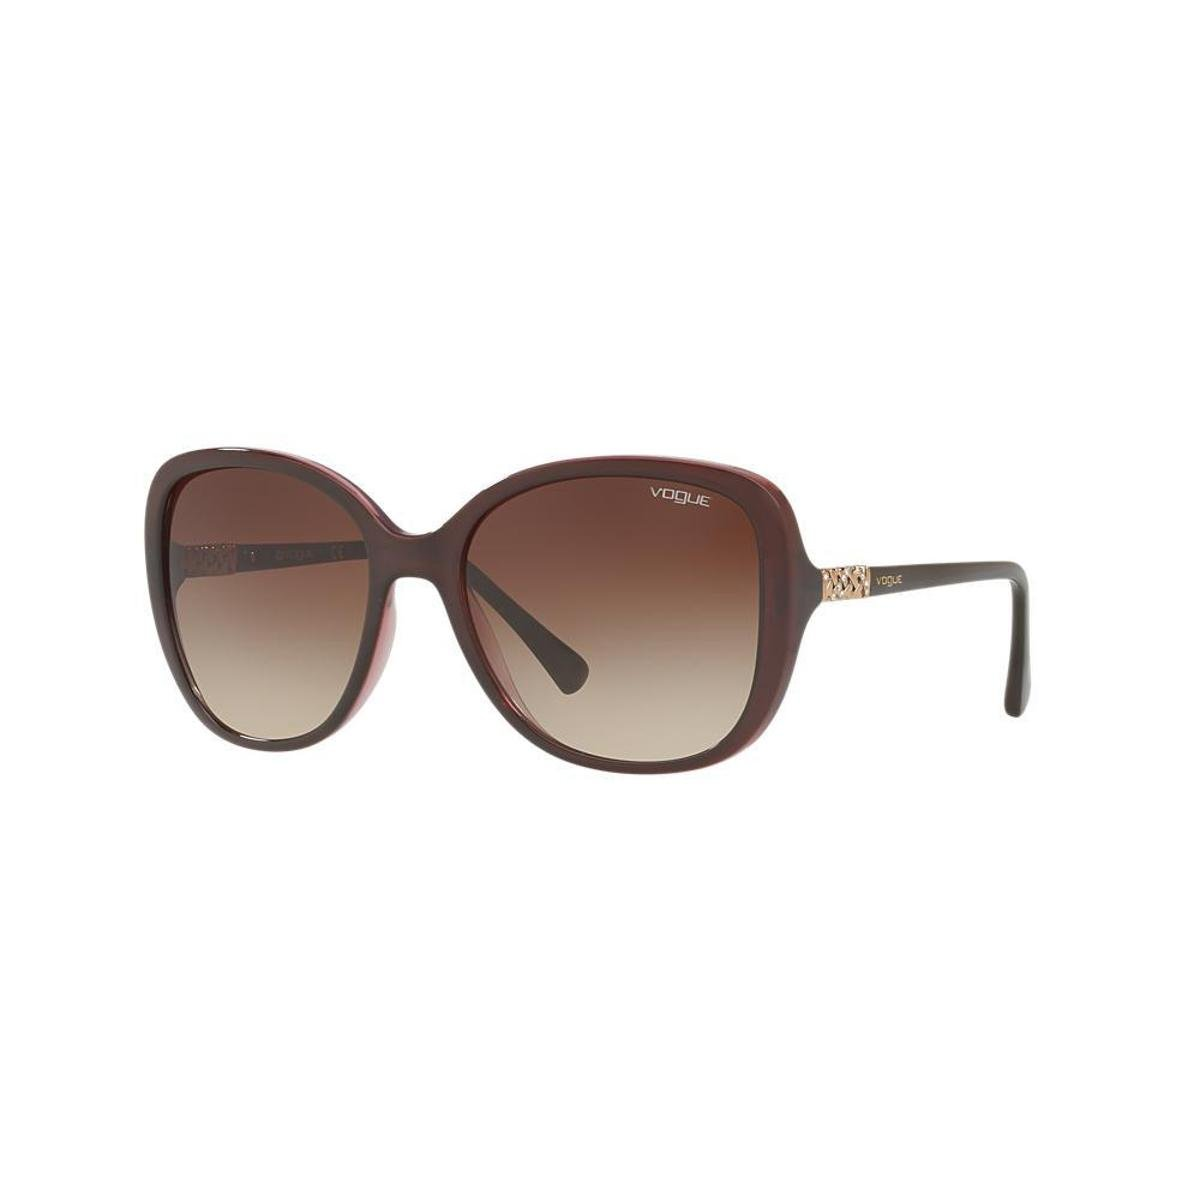 d34f855f4c6d3 Óculos de Sol Vogue Retangular VO5154SB Feminino - Compre Agora ...